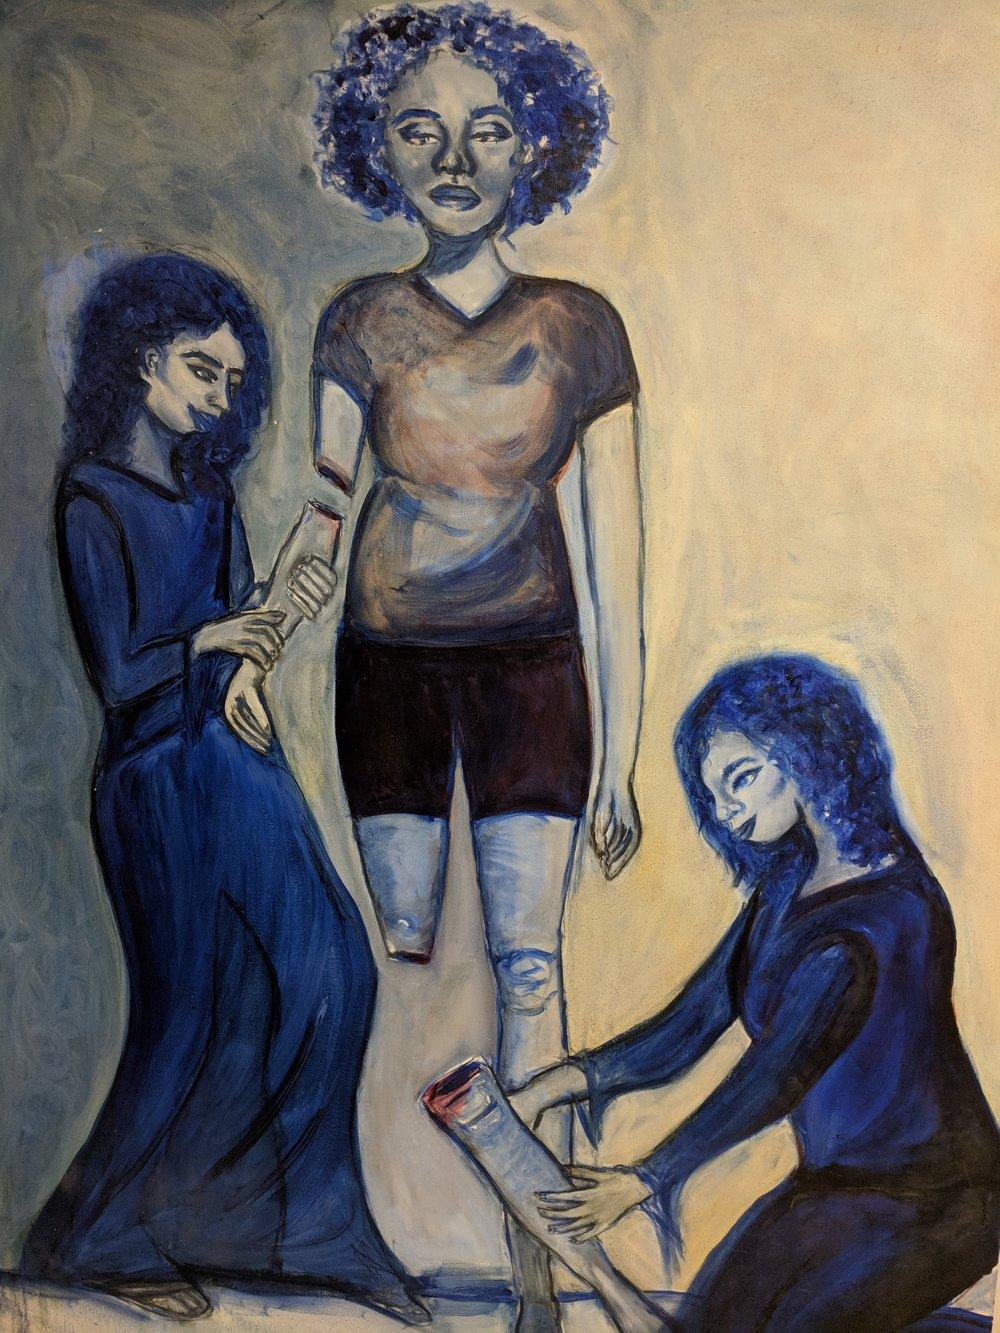 Michaela's Painting